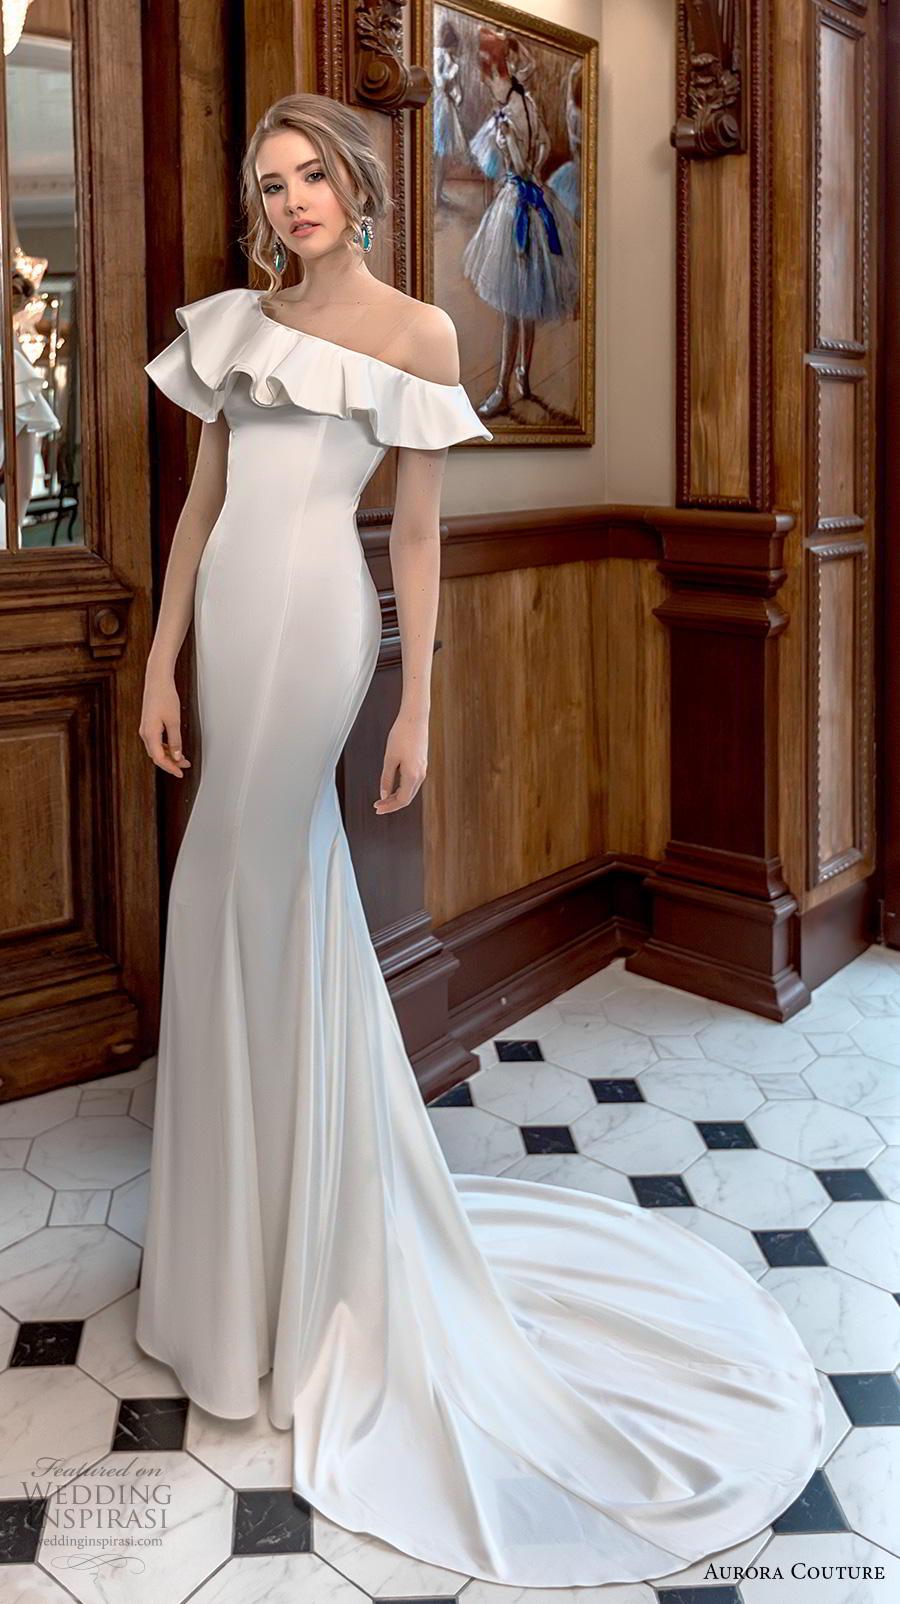 aurora couture 2019 bridal one shoulder flap neckline simple minimalist elegant fit and flare sheath wedding dress chapel train (16) mv